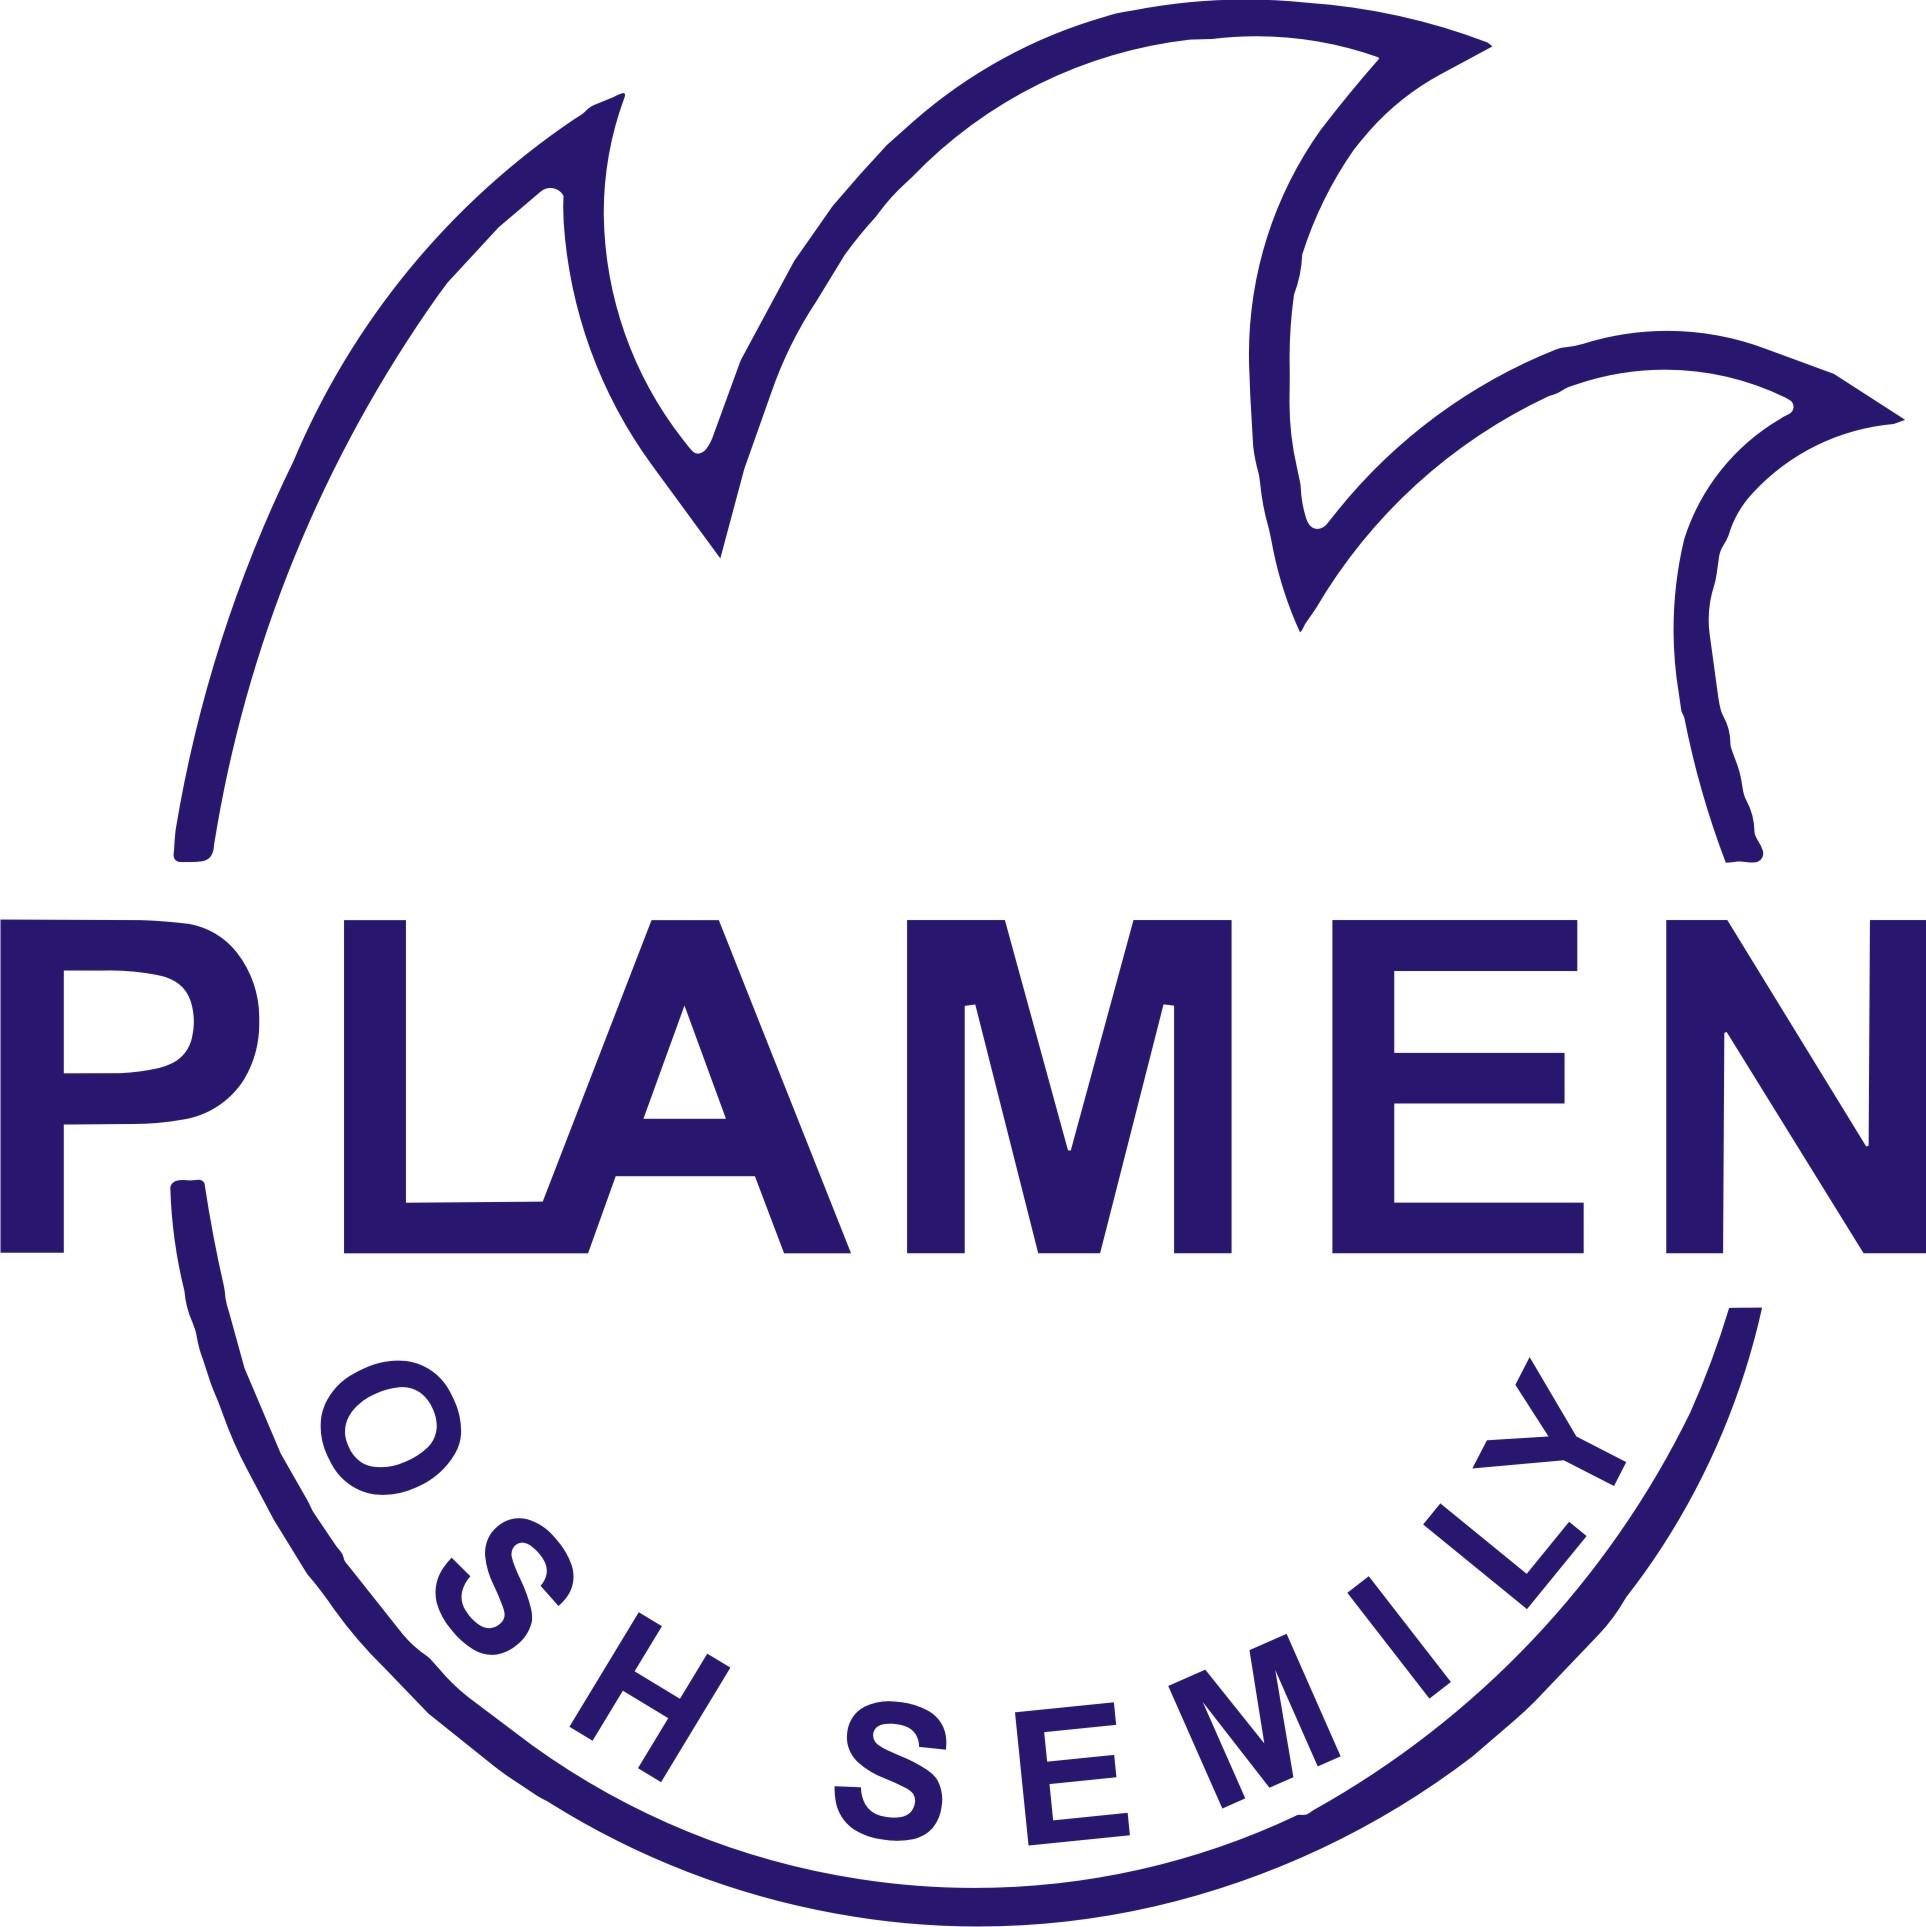 plamen logo